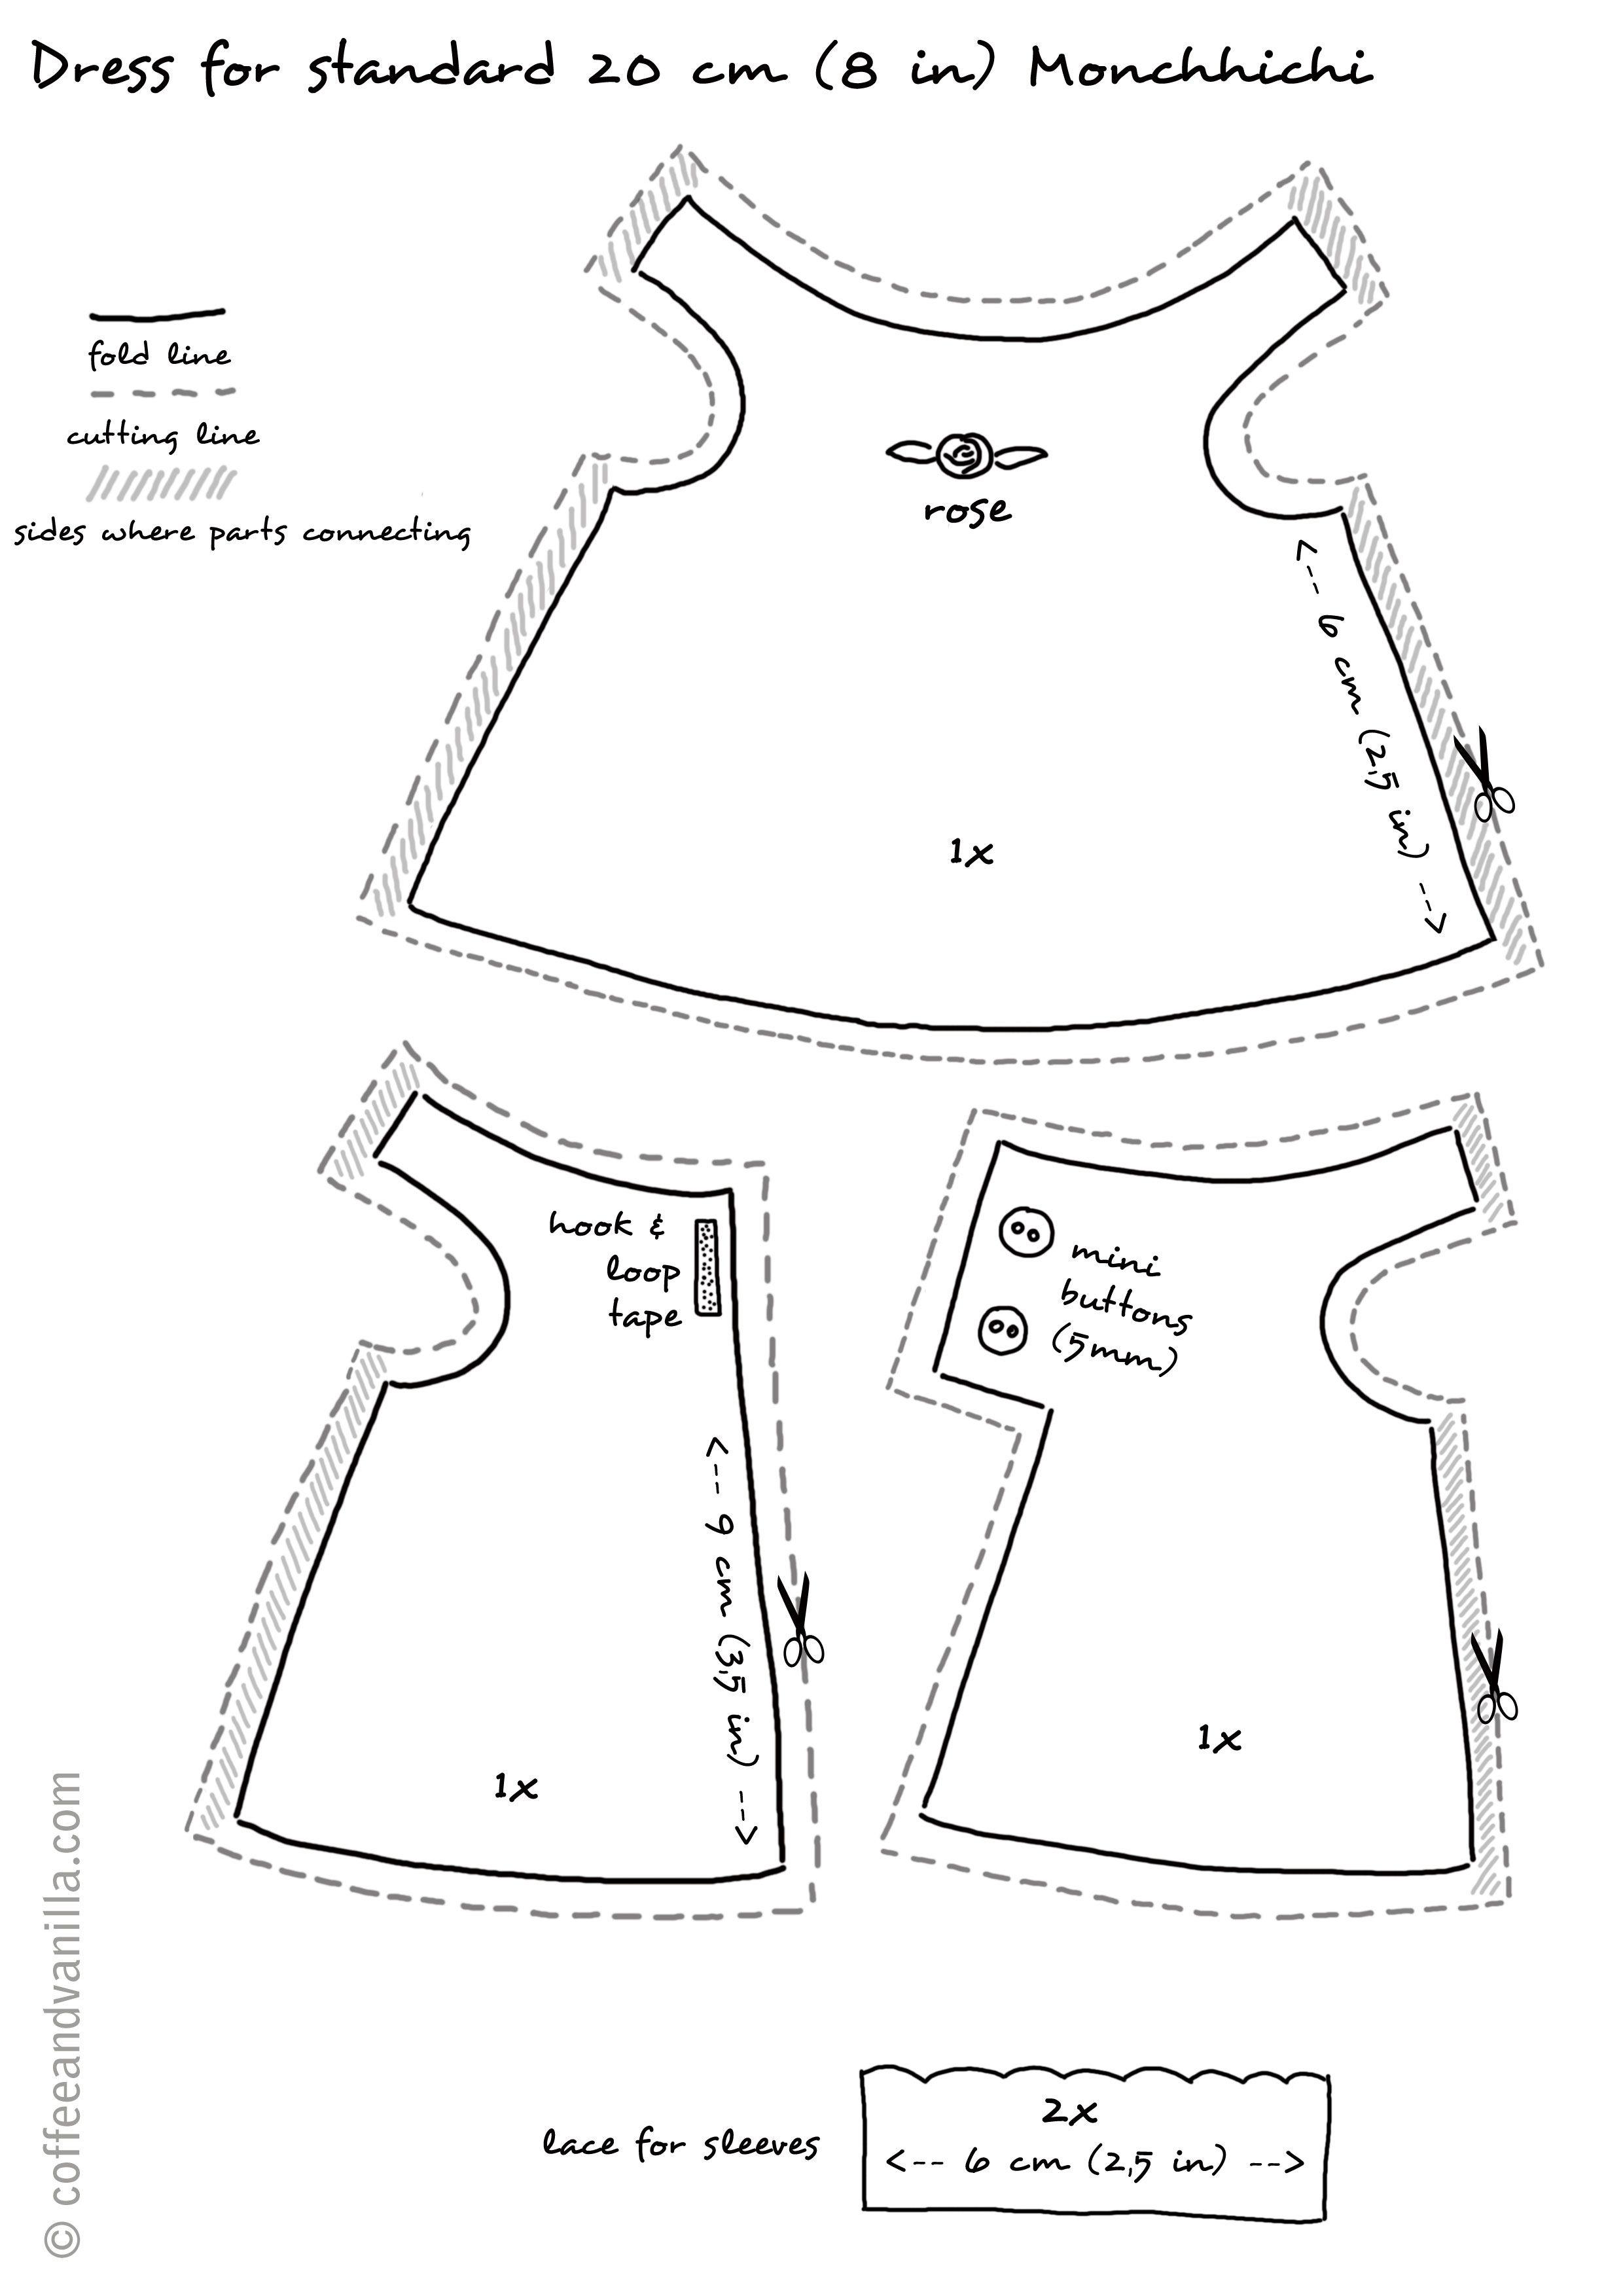 Handmade Dress For Monchhichi | Doll's Dress & Accessories | Doll - Barbie Dress Patterns Free Printable Pdf